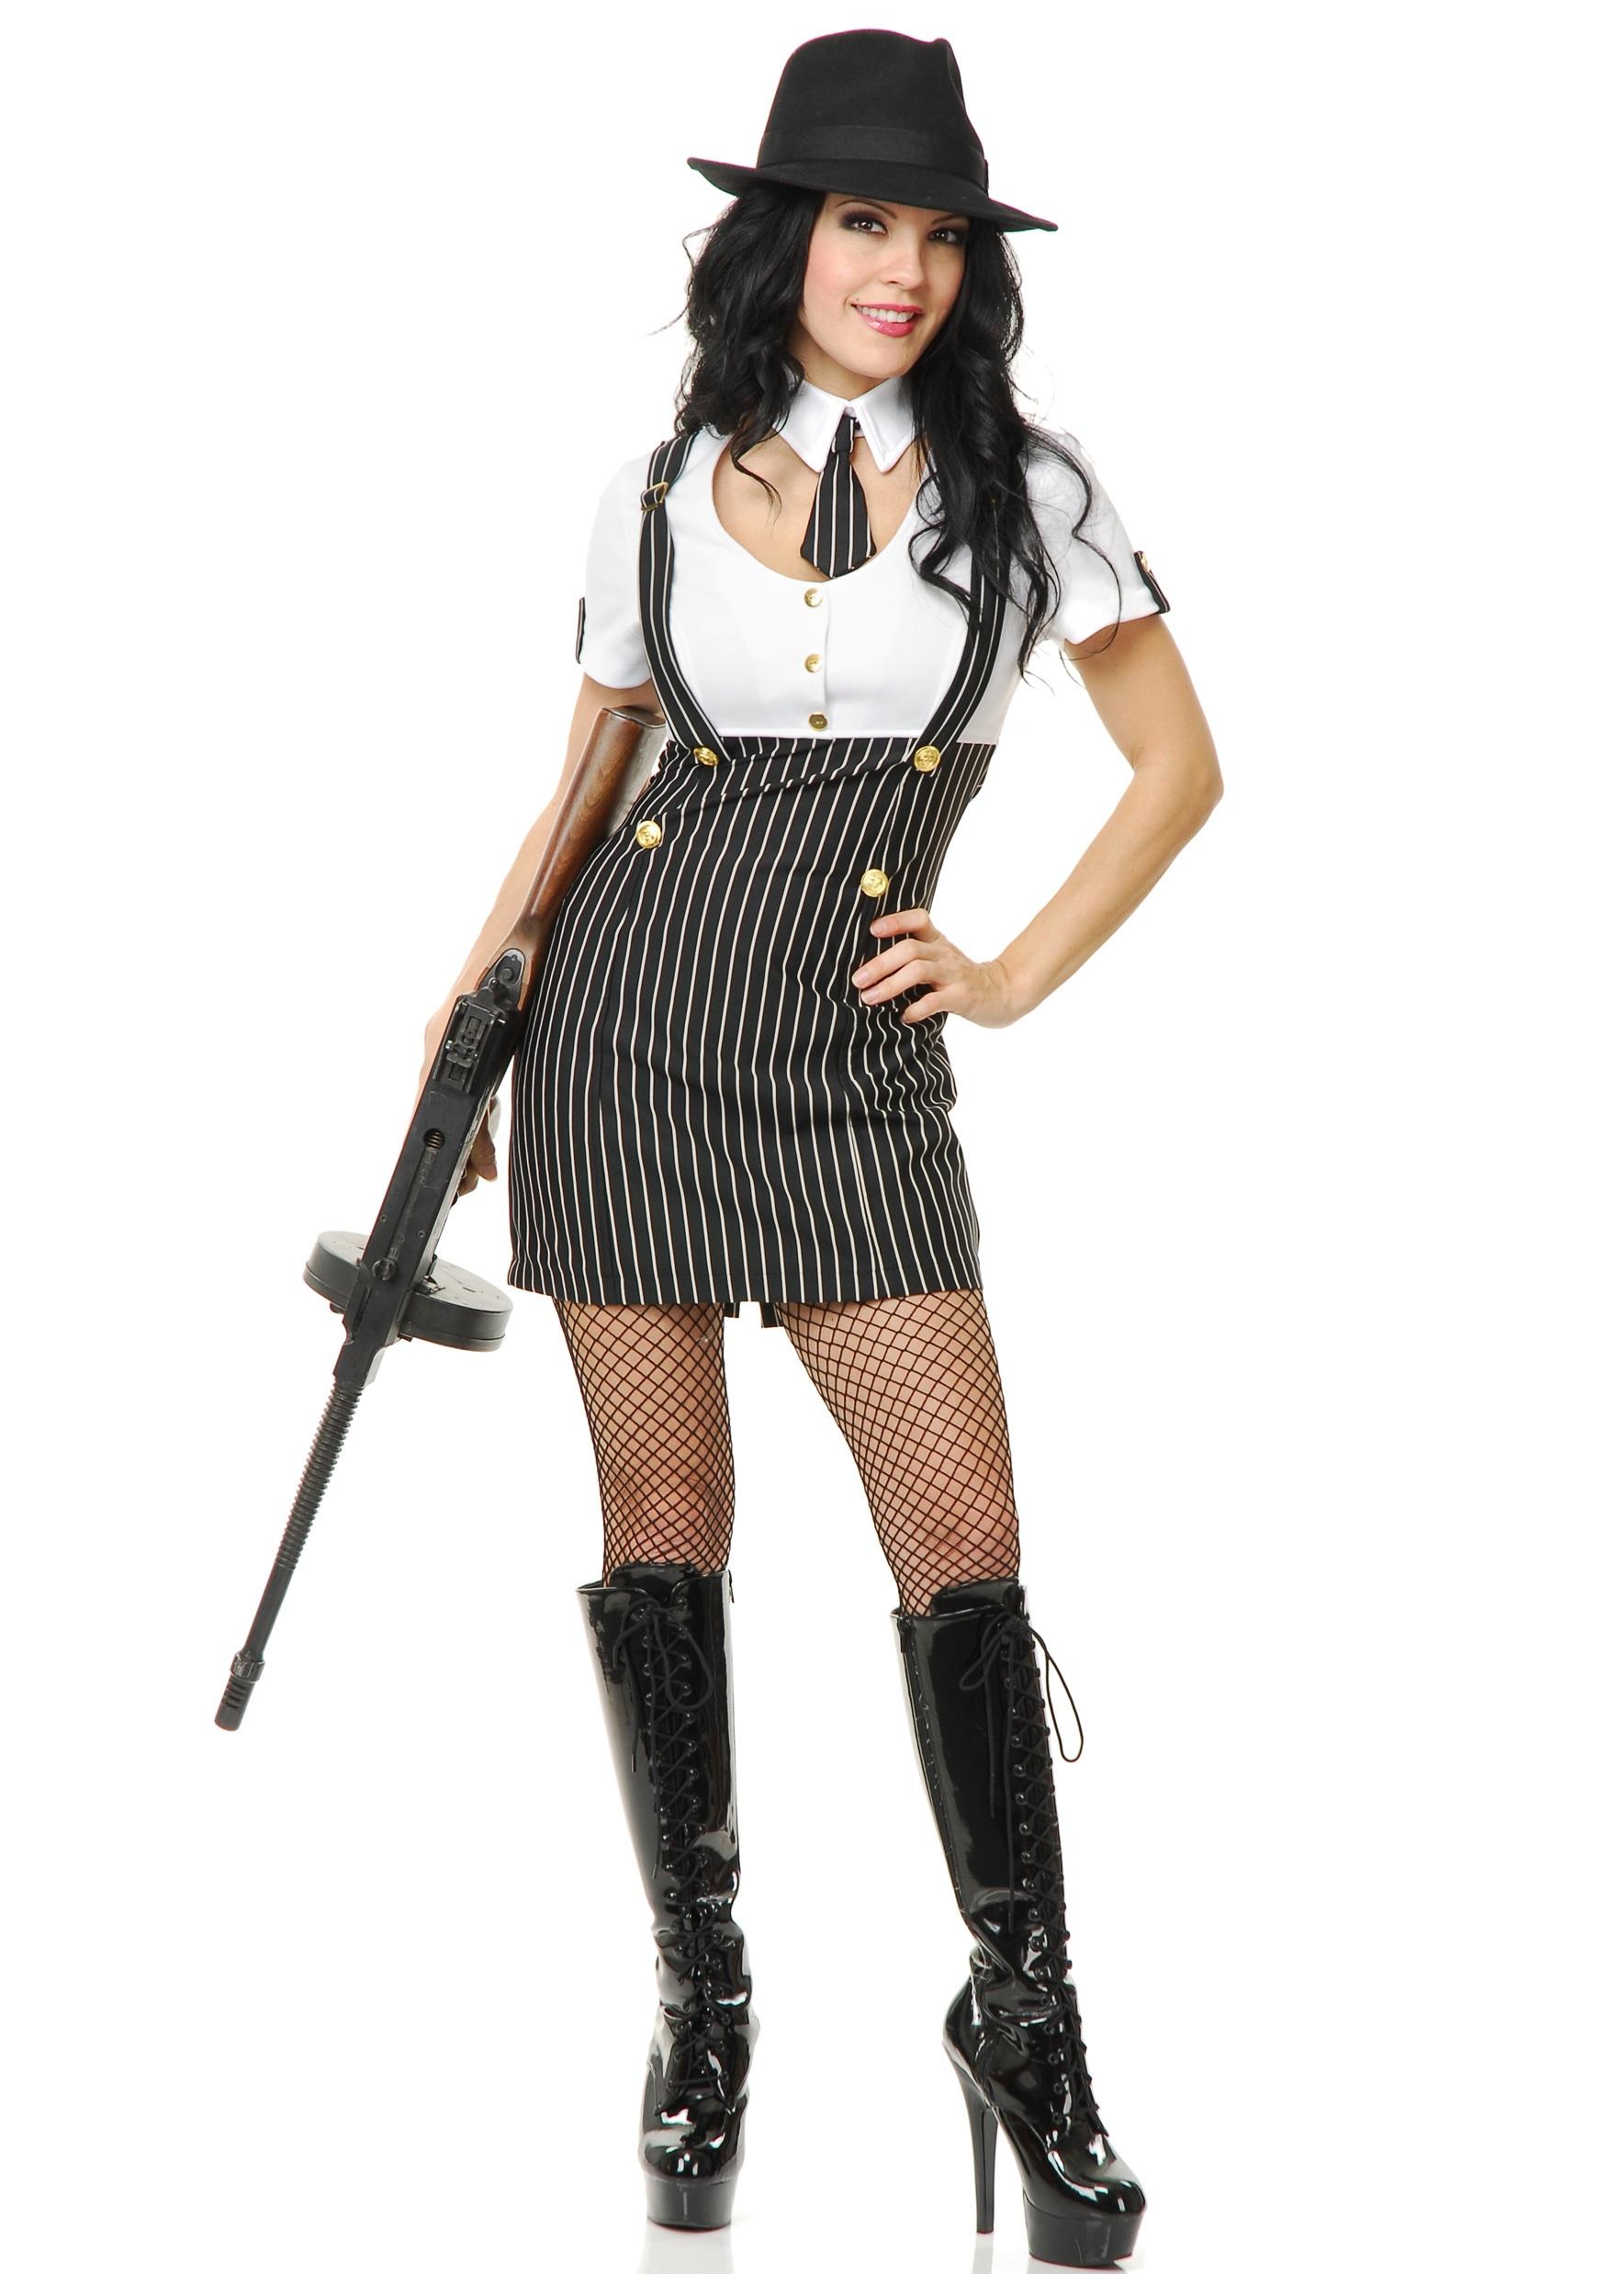 Retro Gangsta Girl Costume  sc 1 st  Halloween Costume & Retro Gangsta Girl Costume - Mobster Costumes for Women